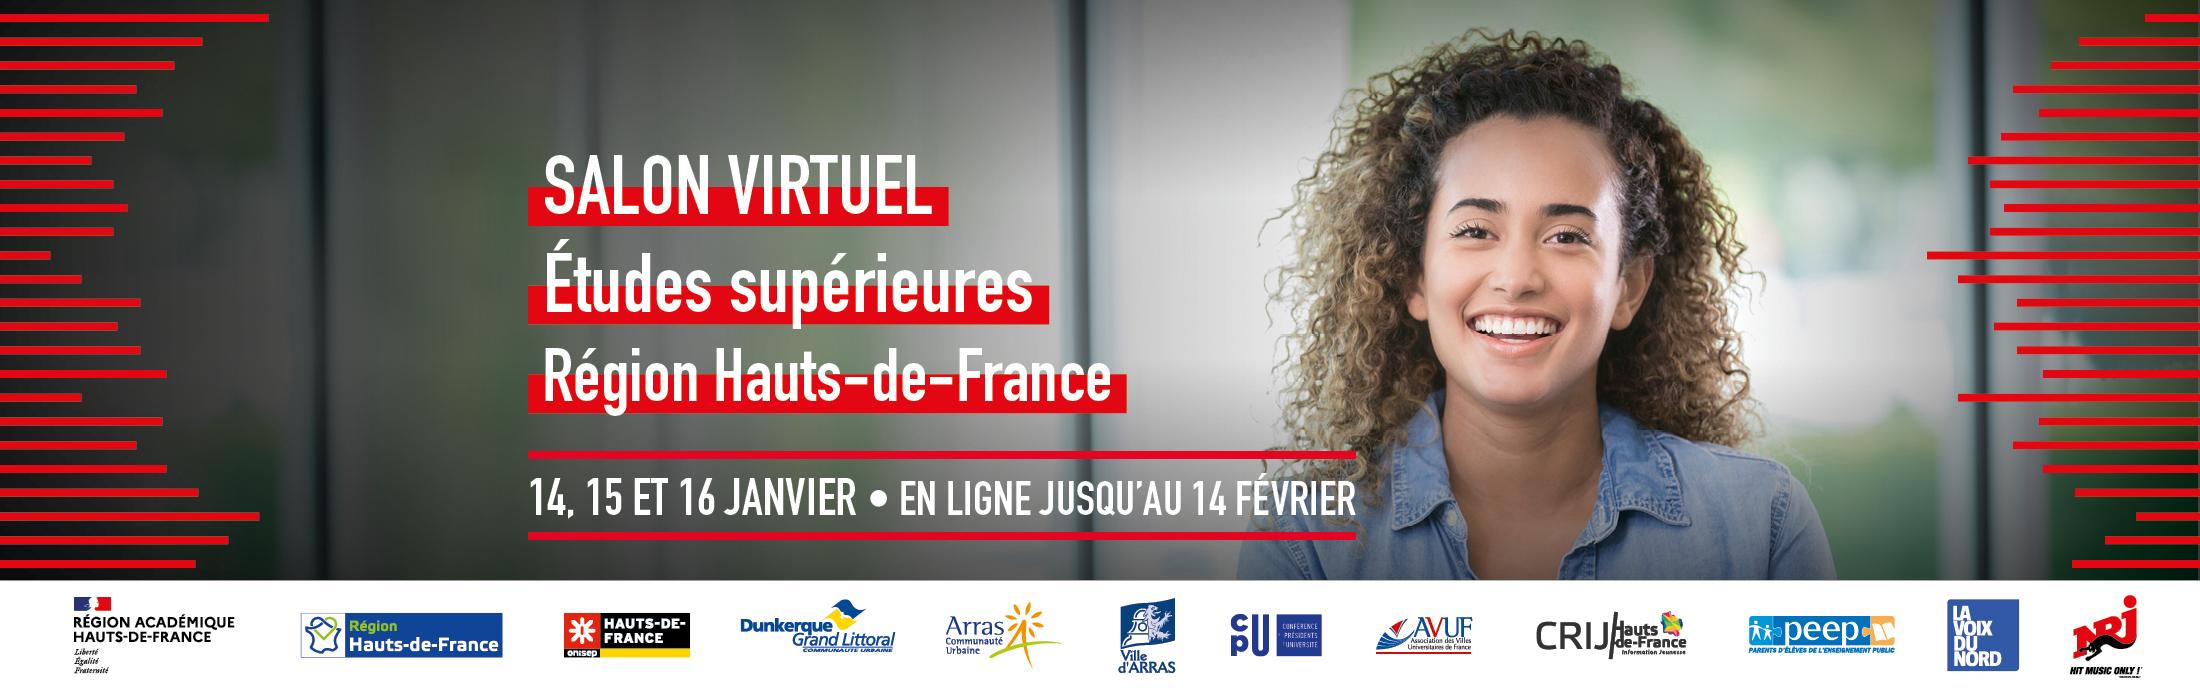 "Virtual Fair ""études supérieures – Hauts-de-France region"" – from January, 14th to 16th 2021"